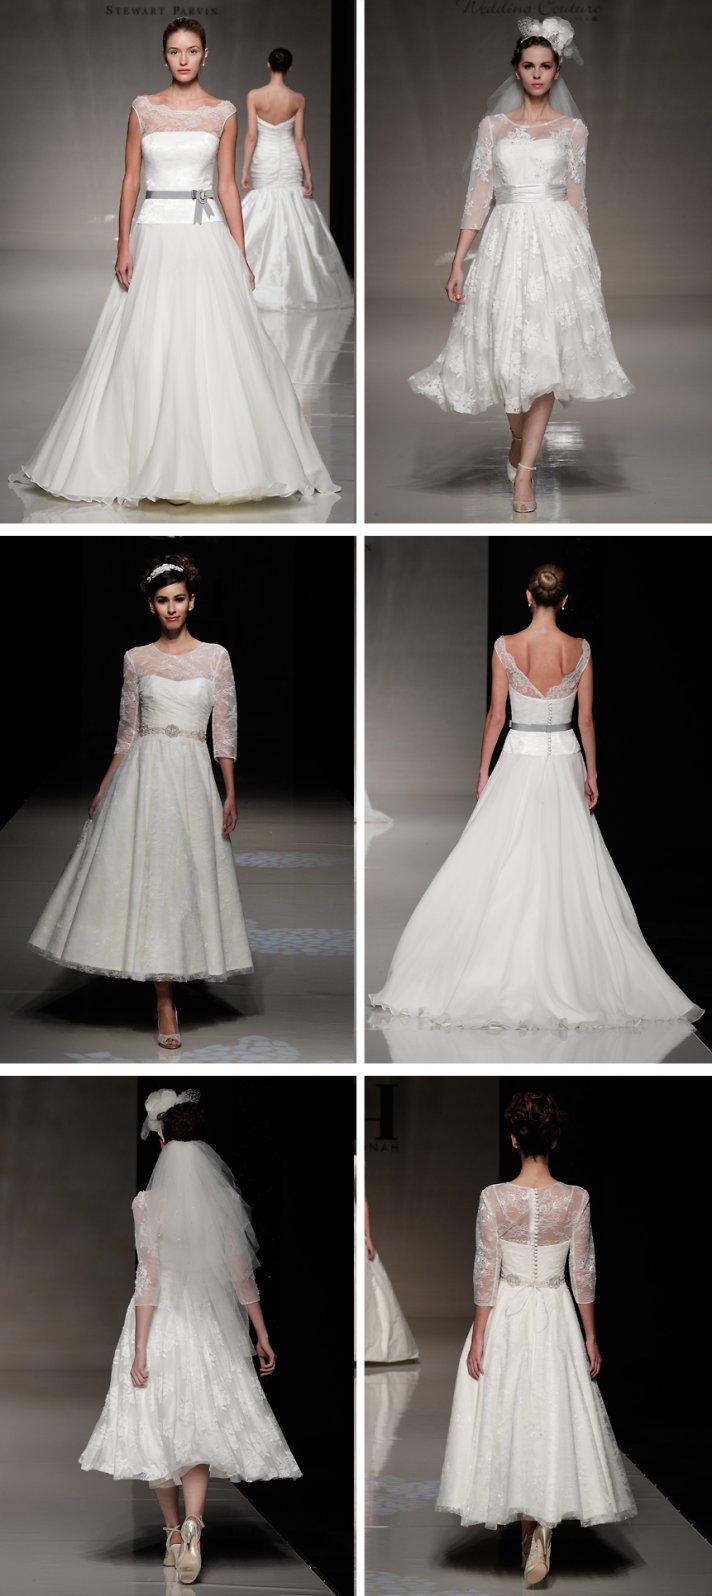 2013 wedding dresses bridal gown inspiration white gallery london illusion neckline